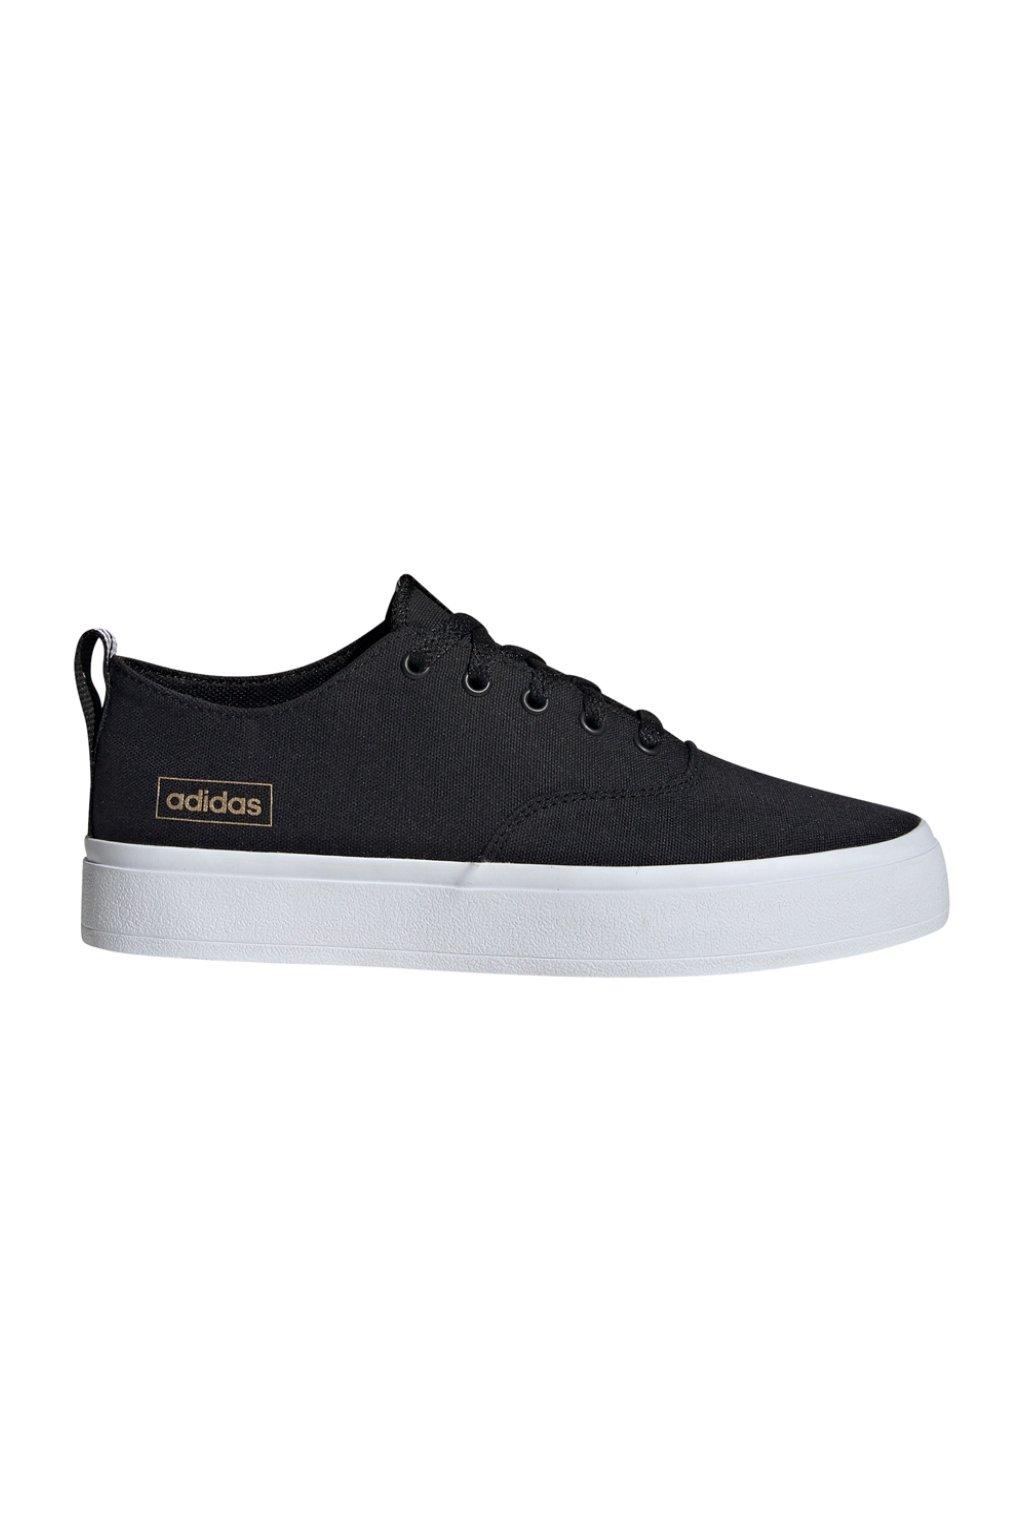 Dámske topánky Adidas Broma, čierne EH2260